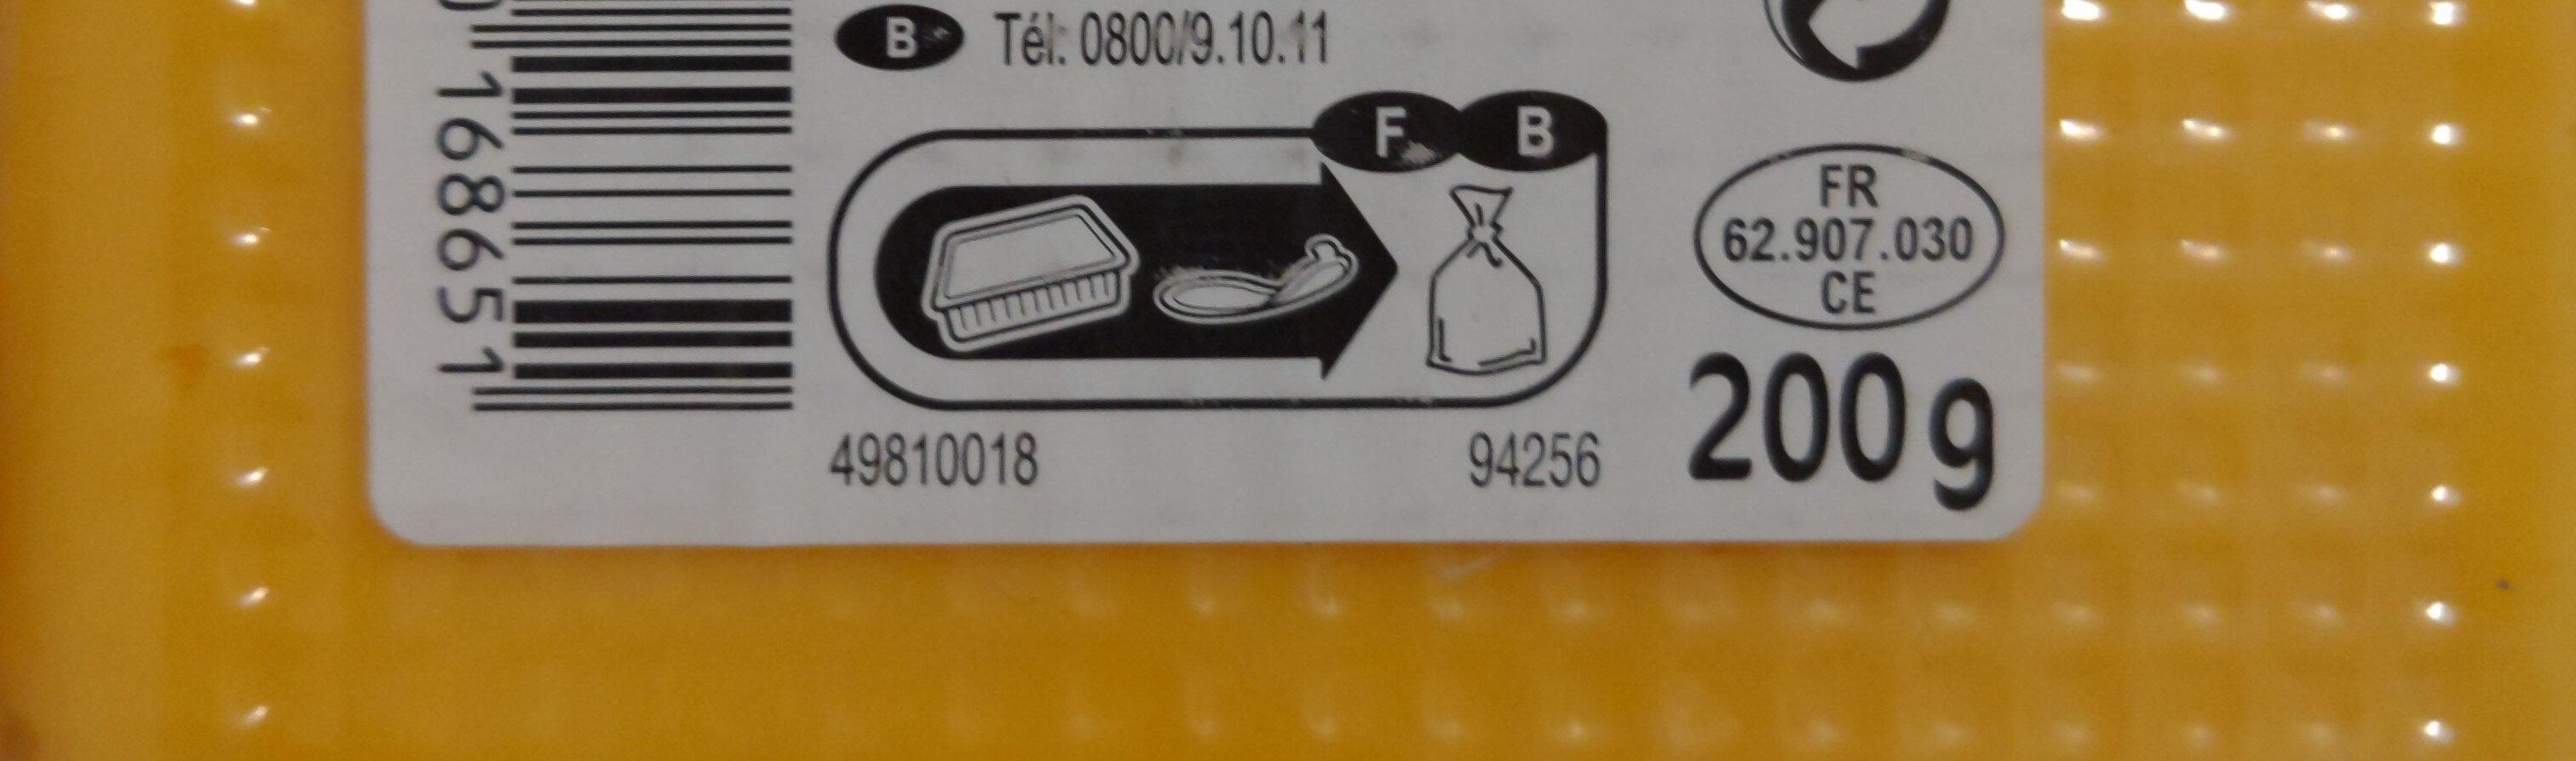 Cheddar - Instruction de recyclage et/ou information d'emballage - fr